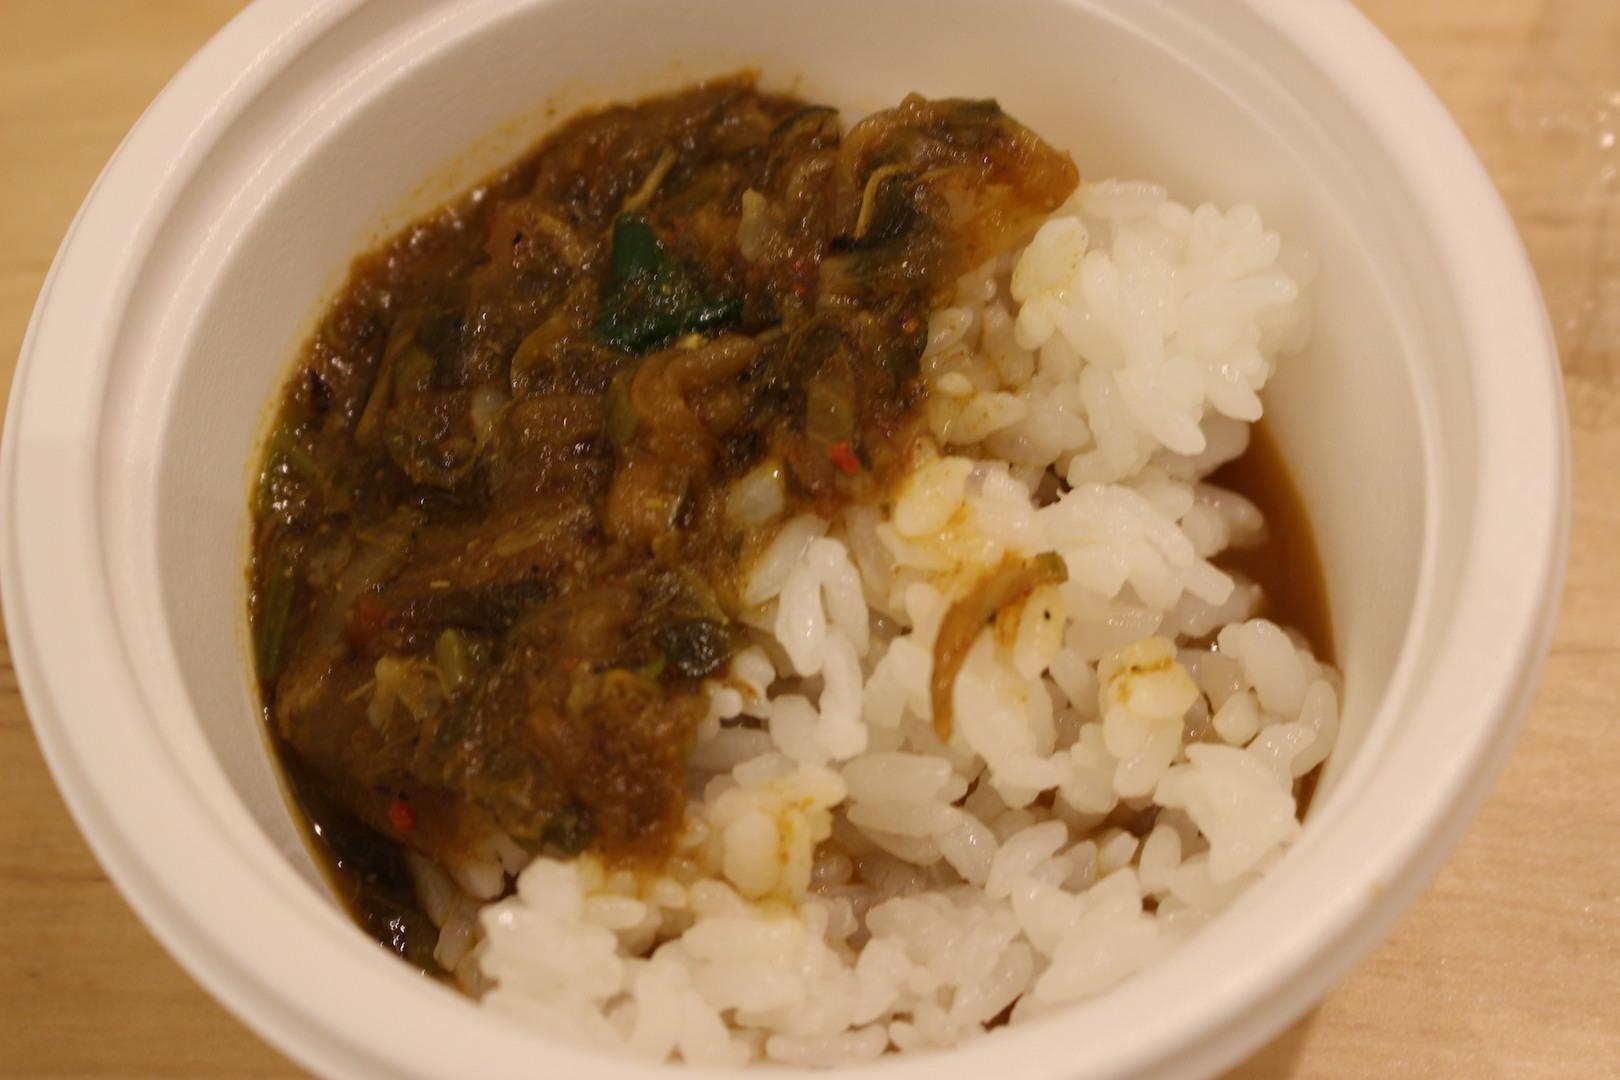 Asian kitchen cafe 百福「コラーゲン尽くし!あんこう出汁のフカヒレカレー」